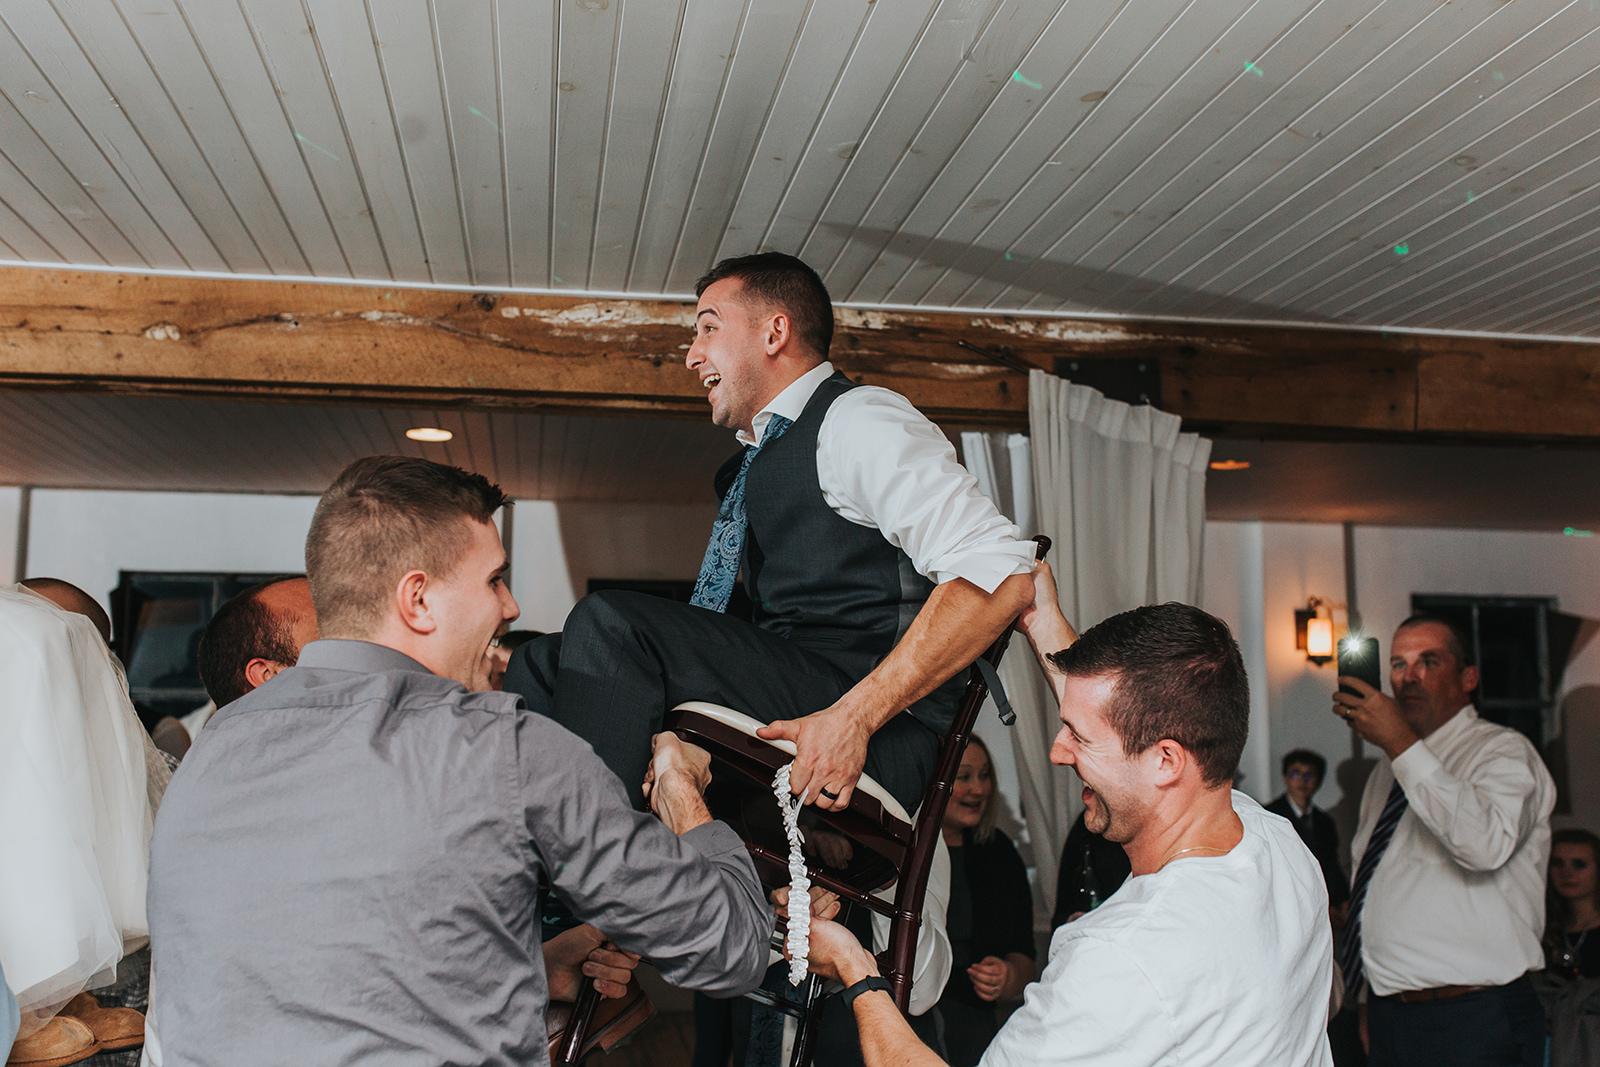 brielle-davis-events-48-fields-wedding-dancing-groom.jpg